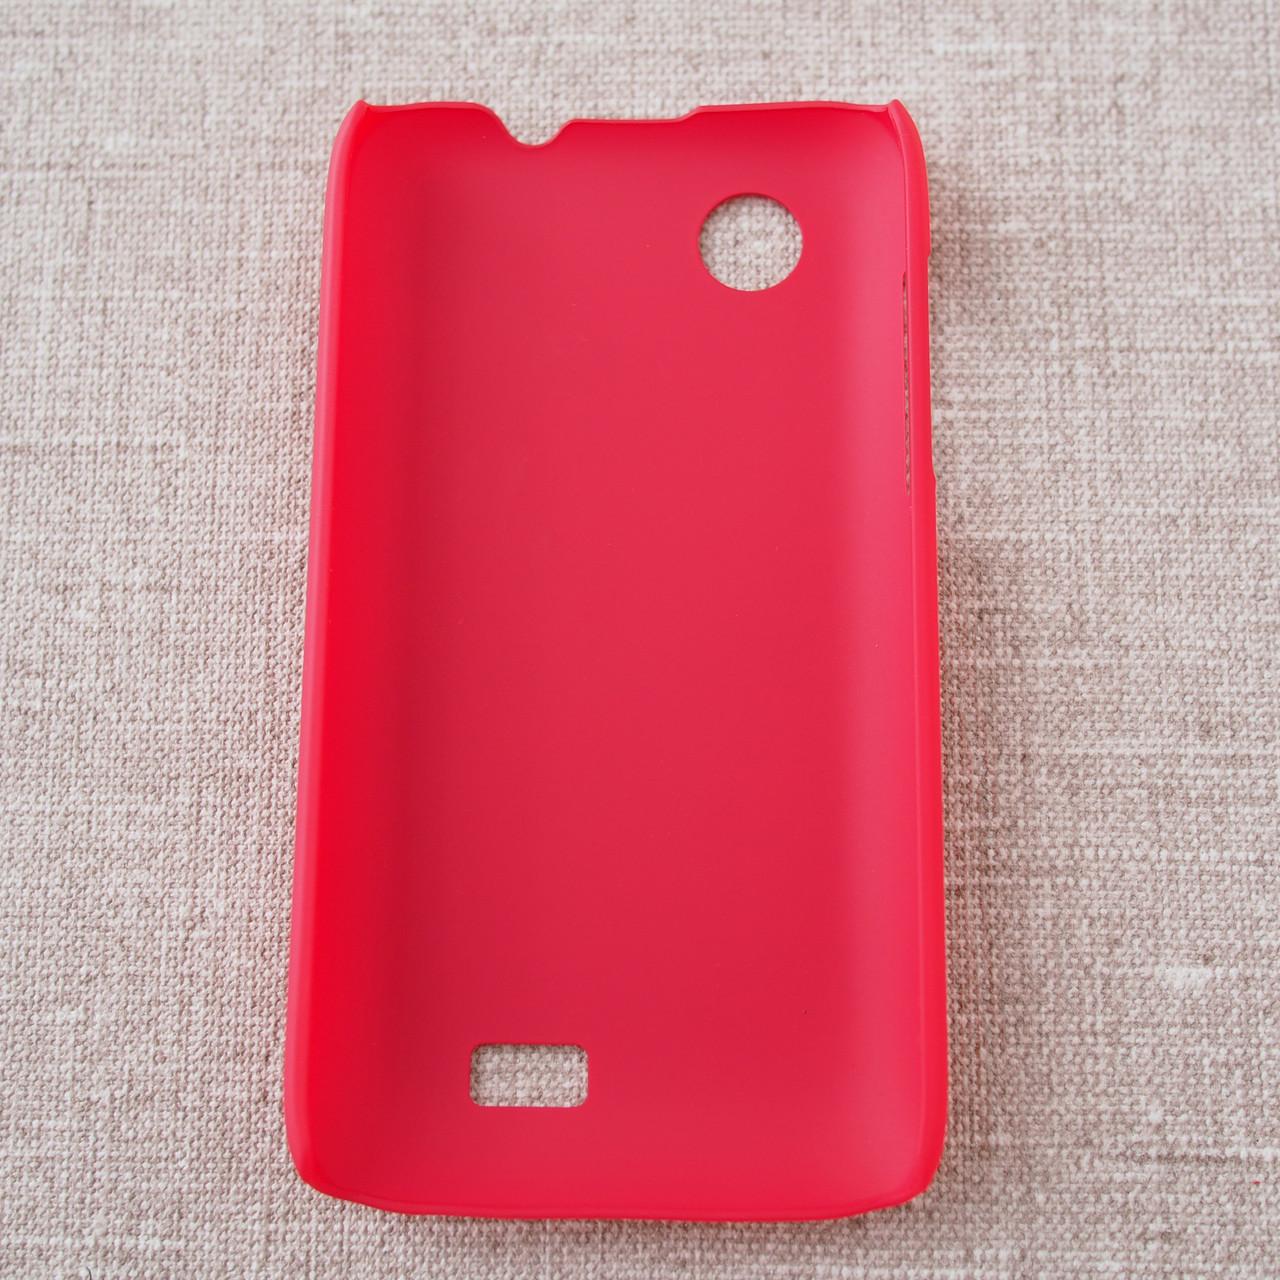 Nillkin Super Frosted Shield Lenovo A369 red Для телефона